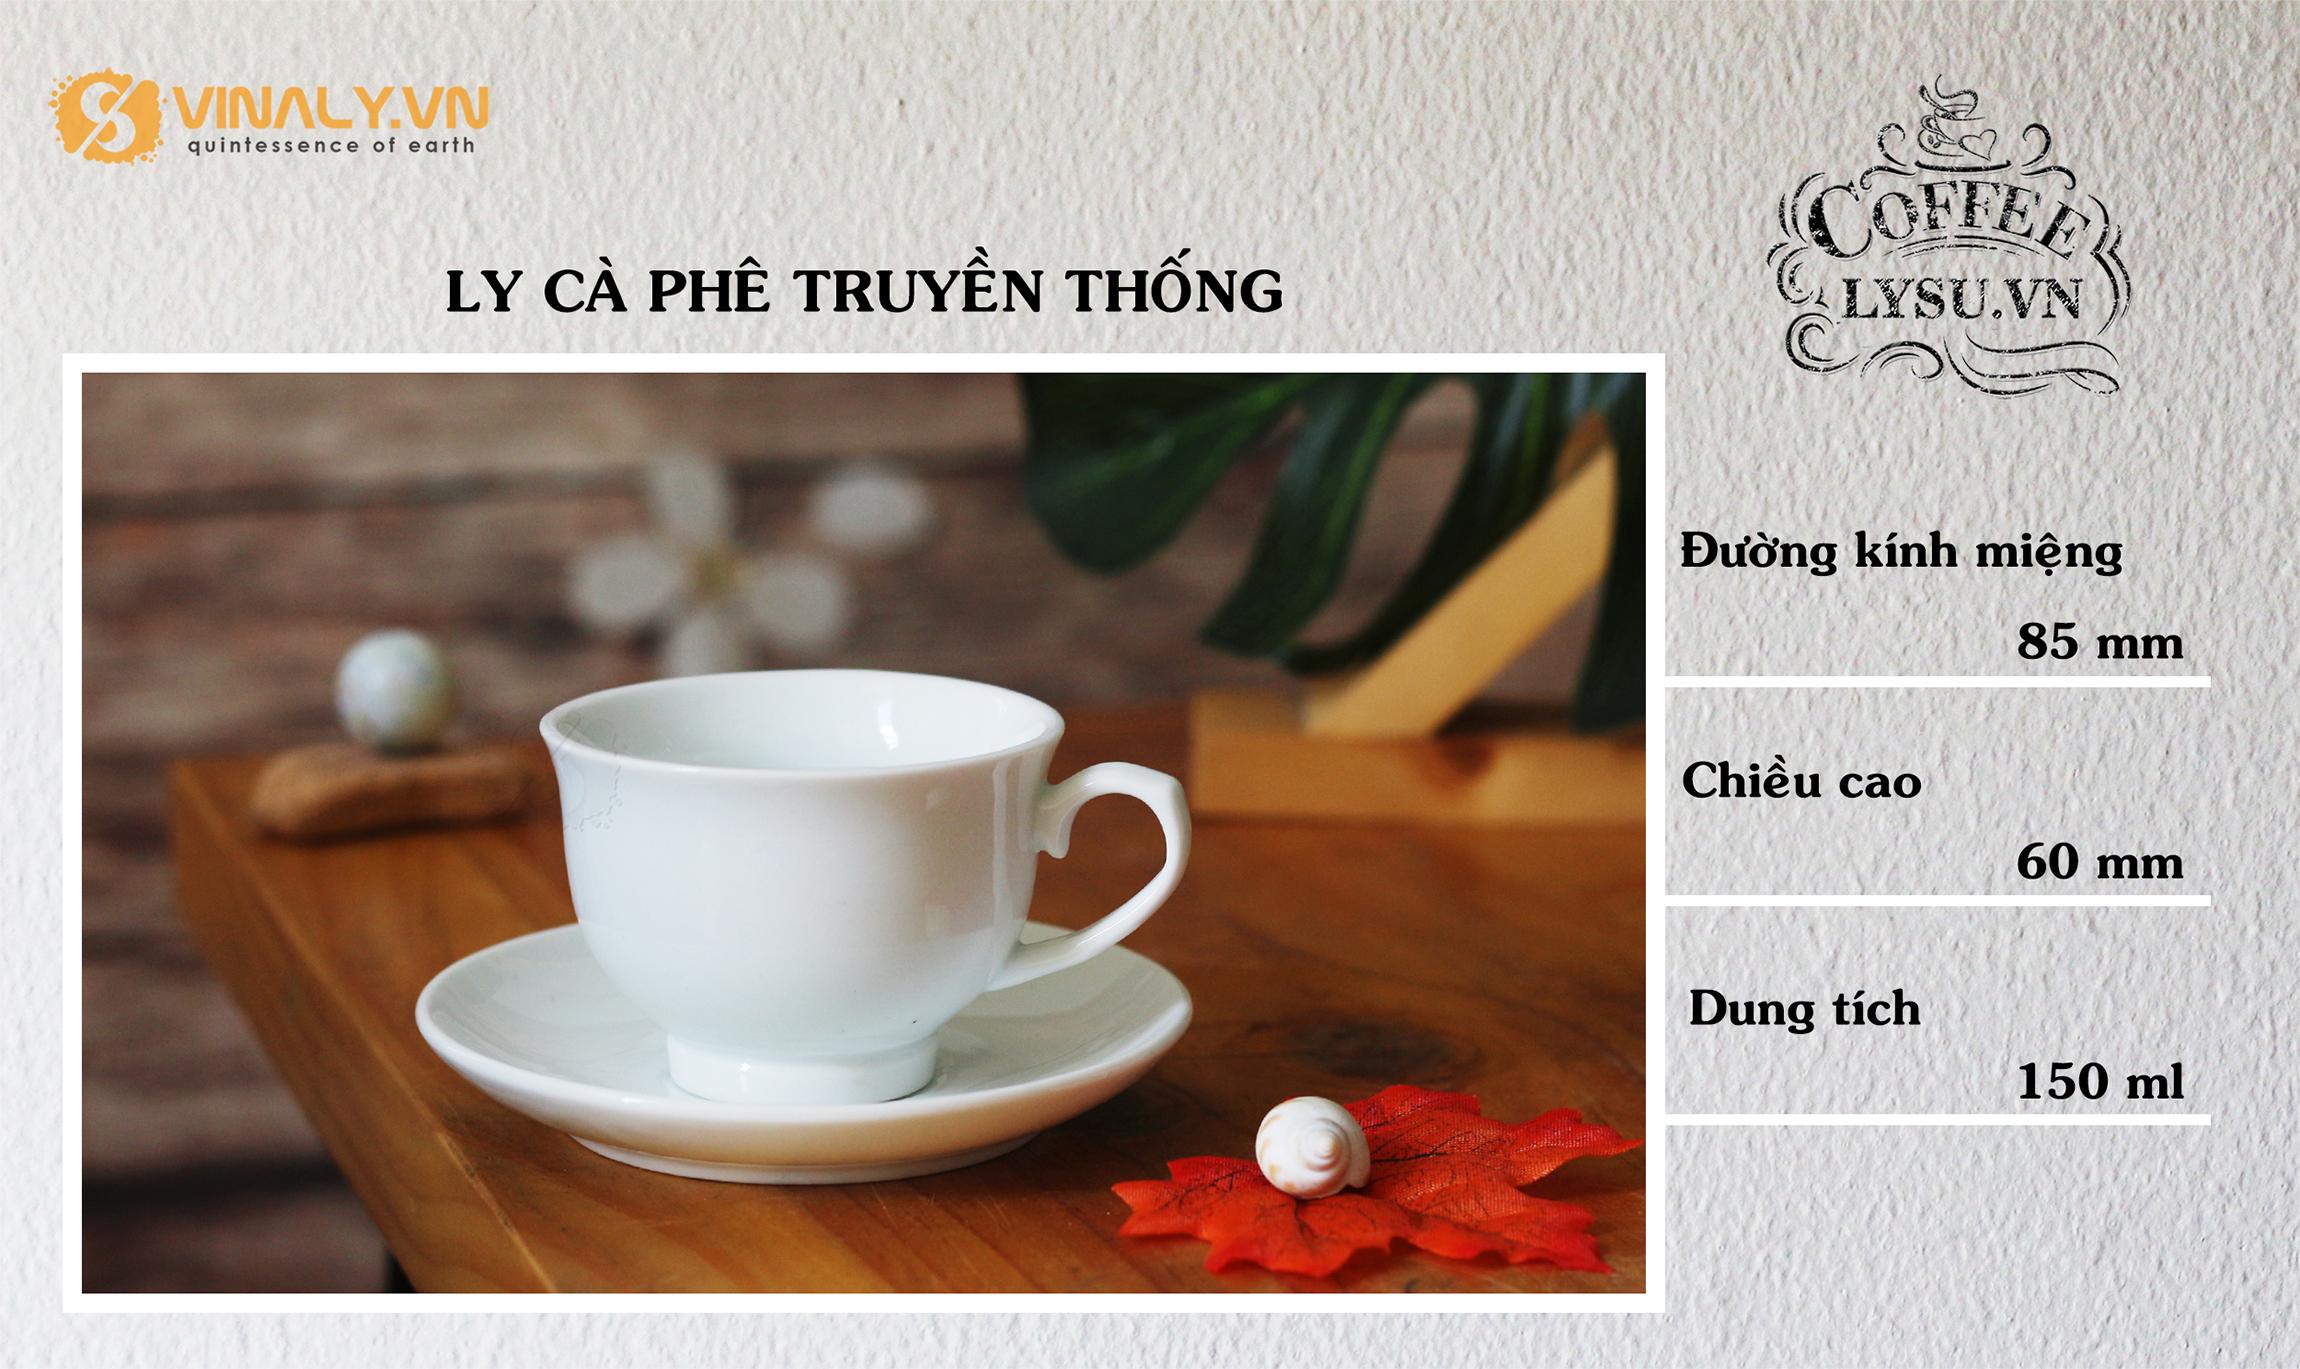 ly-su-vinaly-ly-su-quan-cafe-ly-ca-phe-truyen-thong-kieu moi-